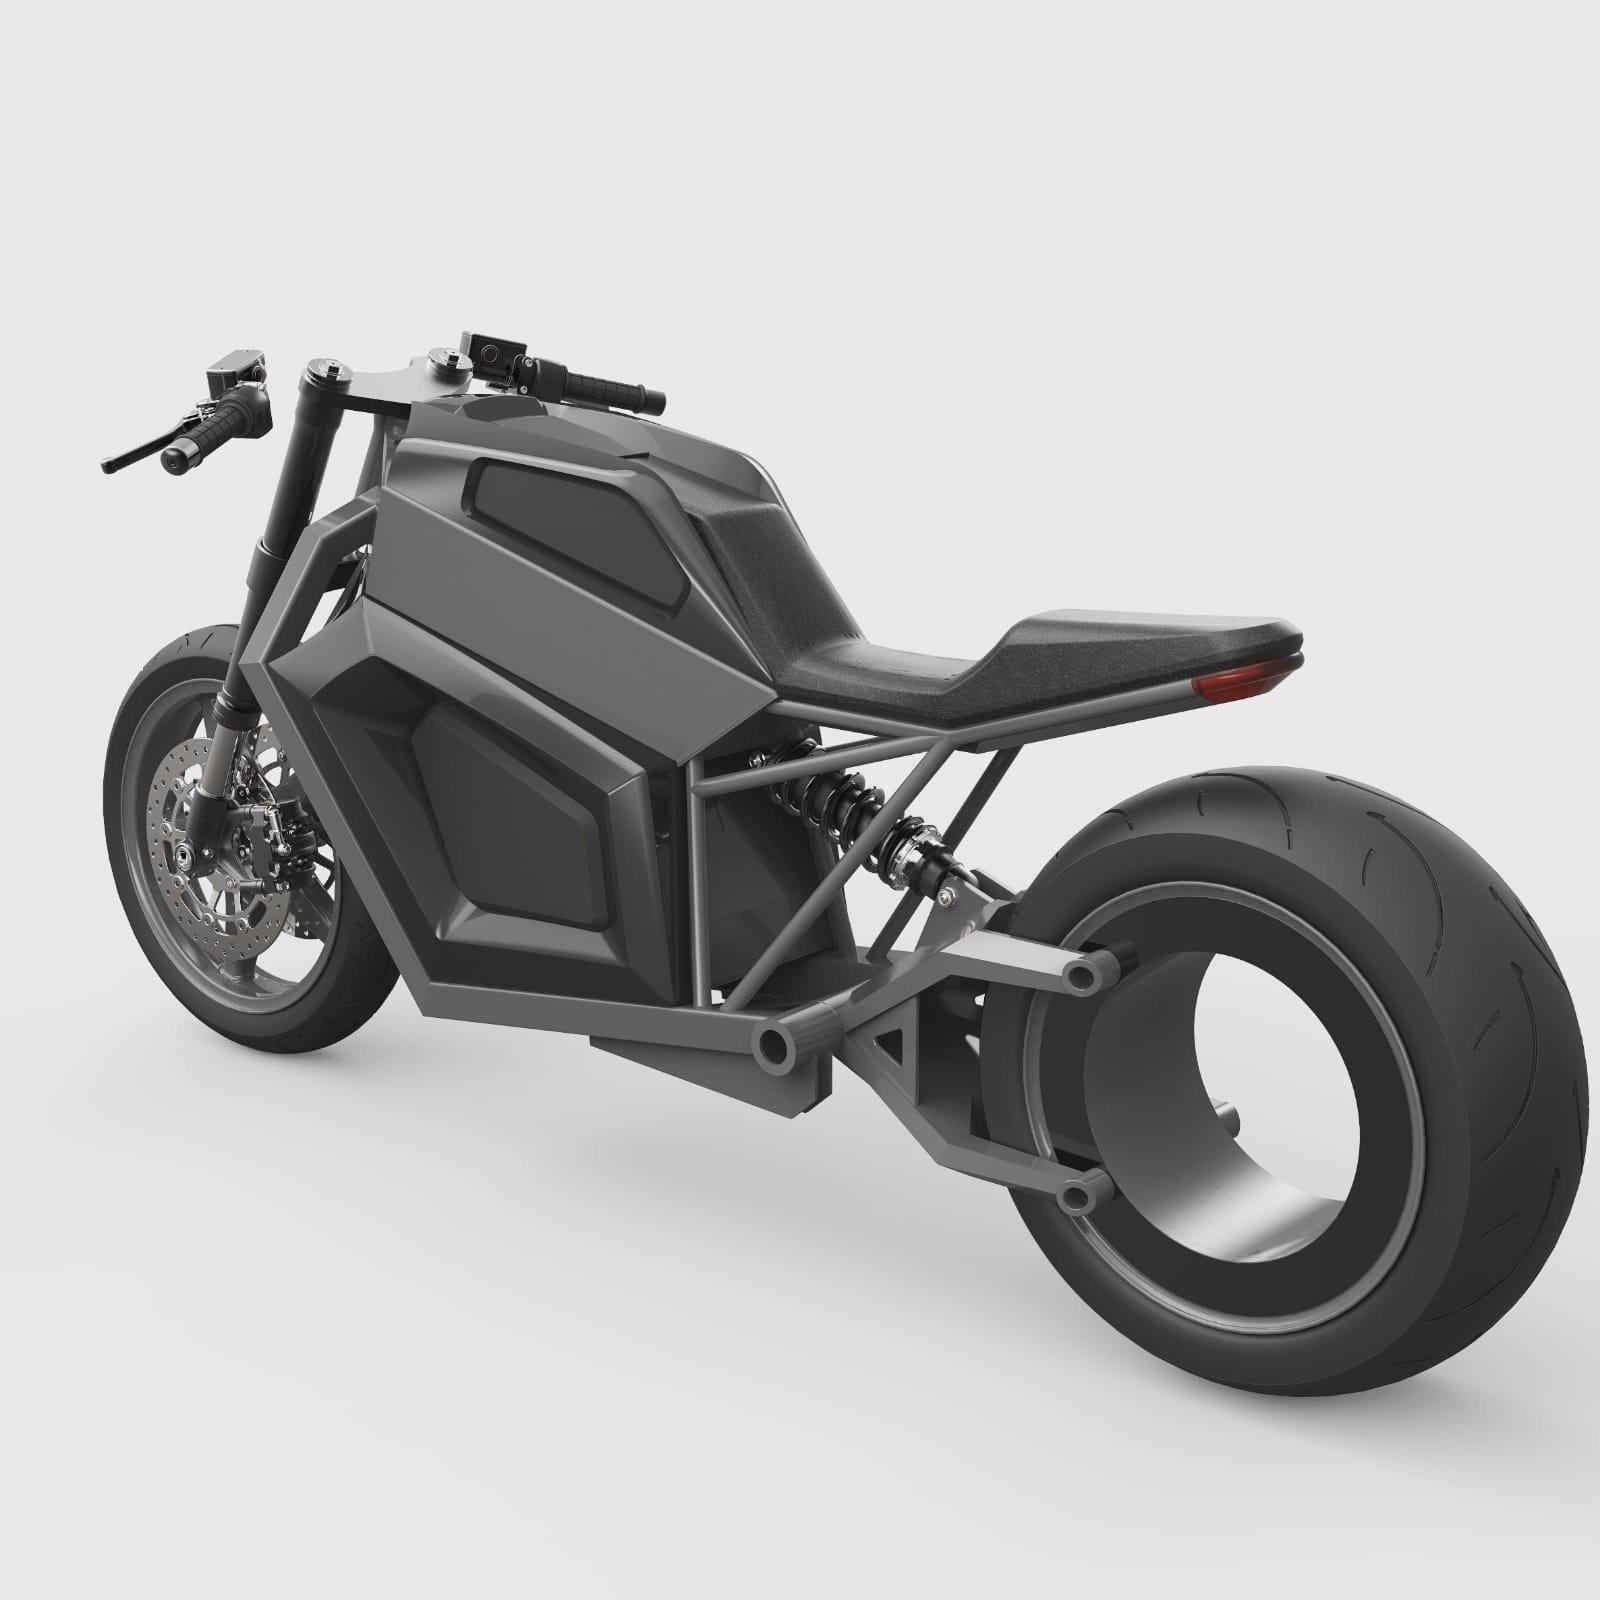 rmk-electric-motorcycle-rear-wheel 2